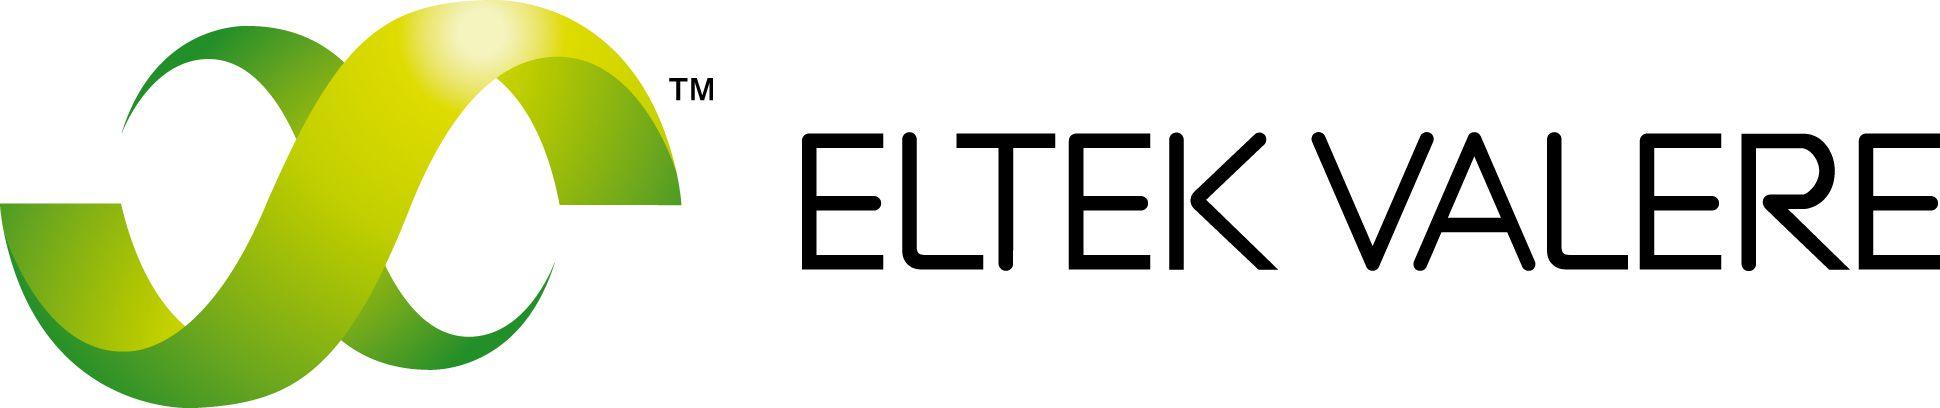 eltek valere logo partner